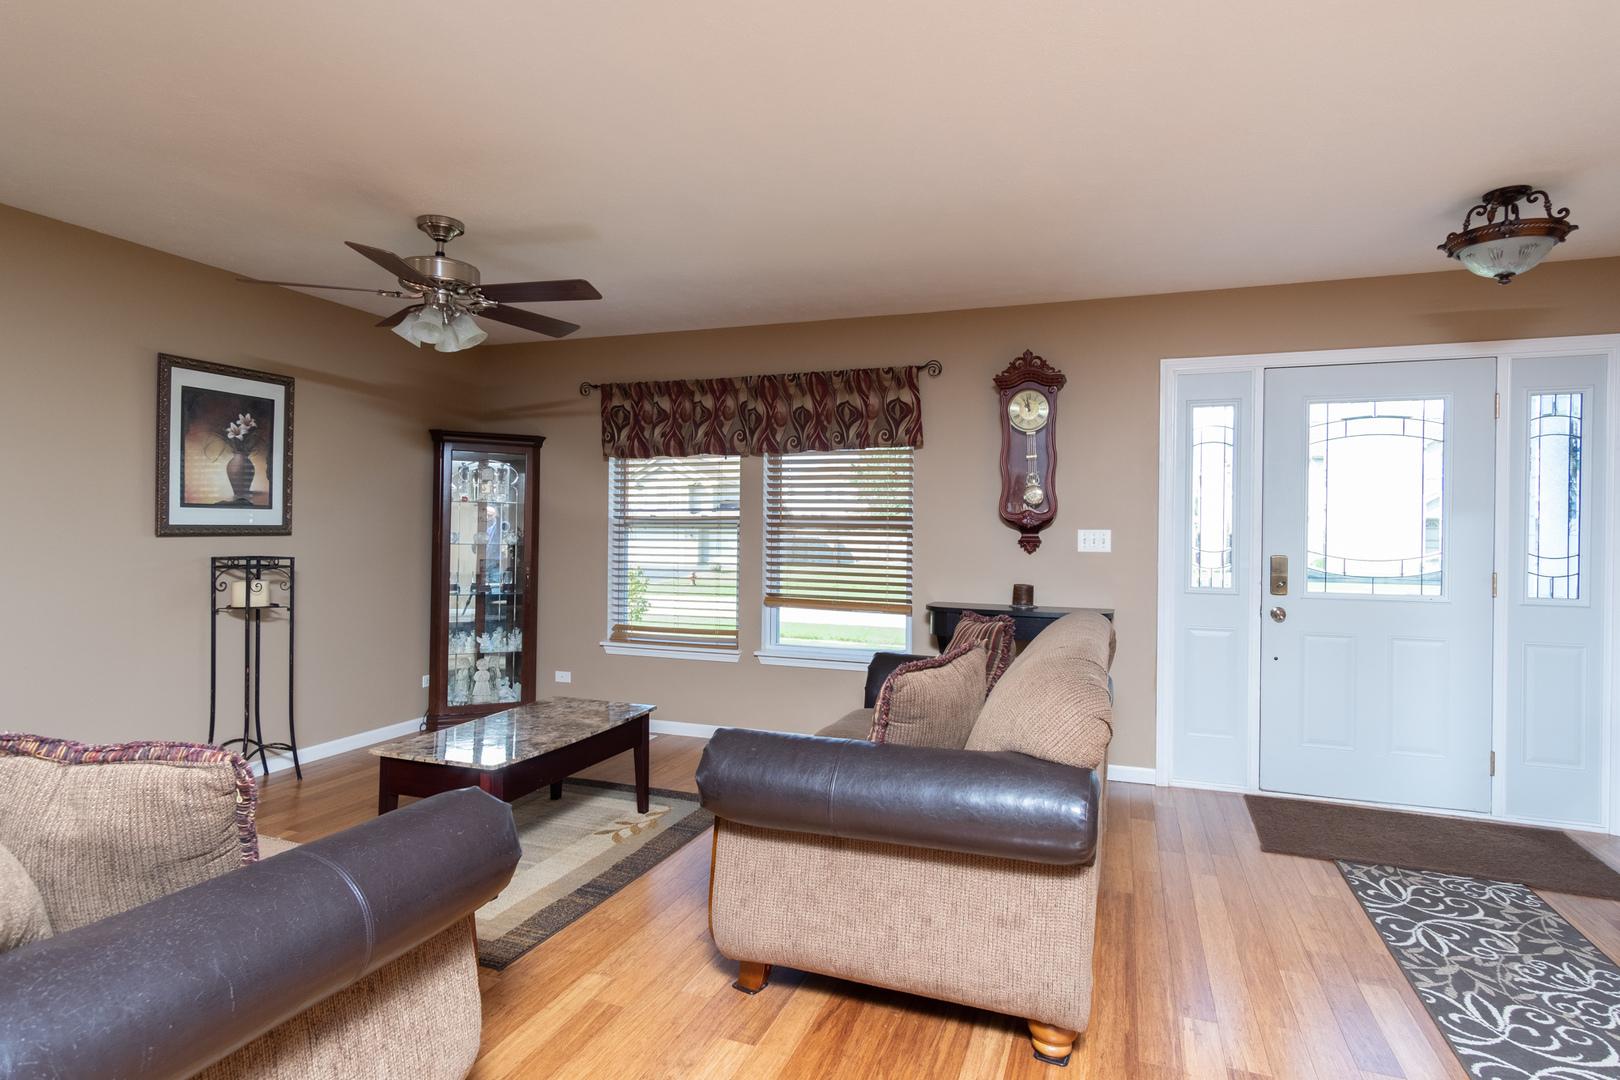 313 Greenbriar, Poplar Grove, Illinois, 61065